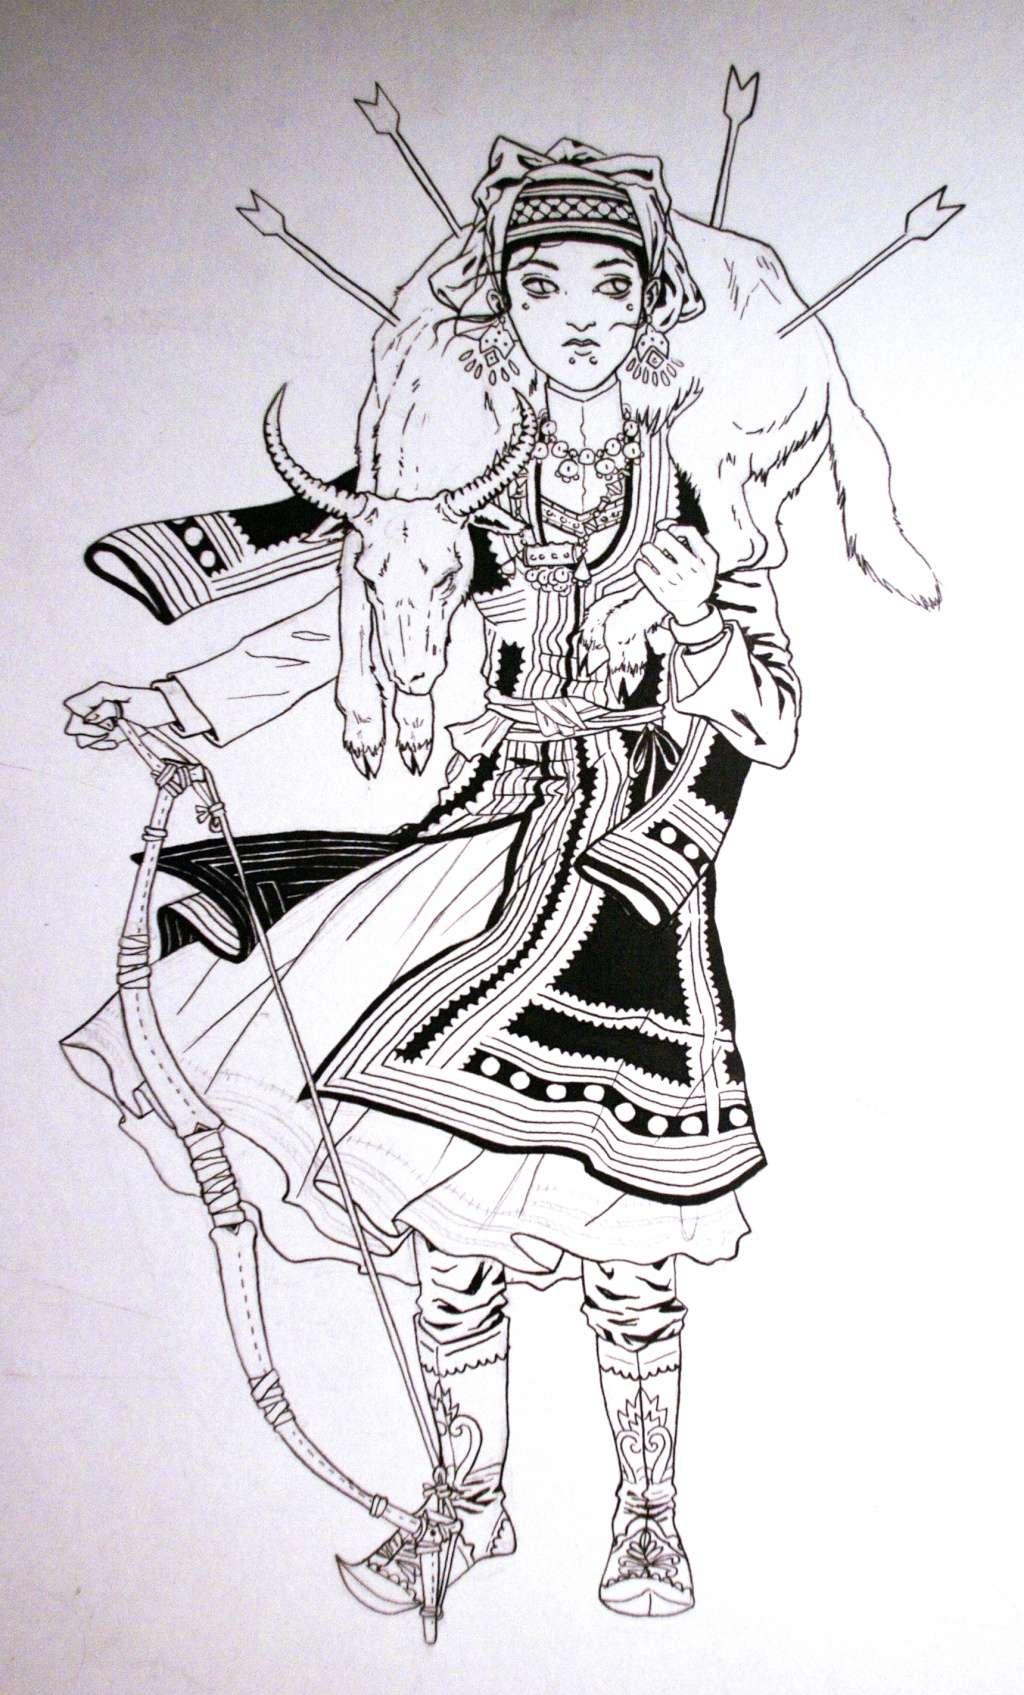 -La Galerie d'Okhamii- - Page 8 Imgp8612